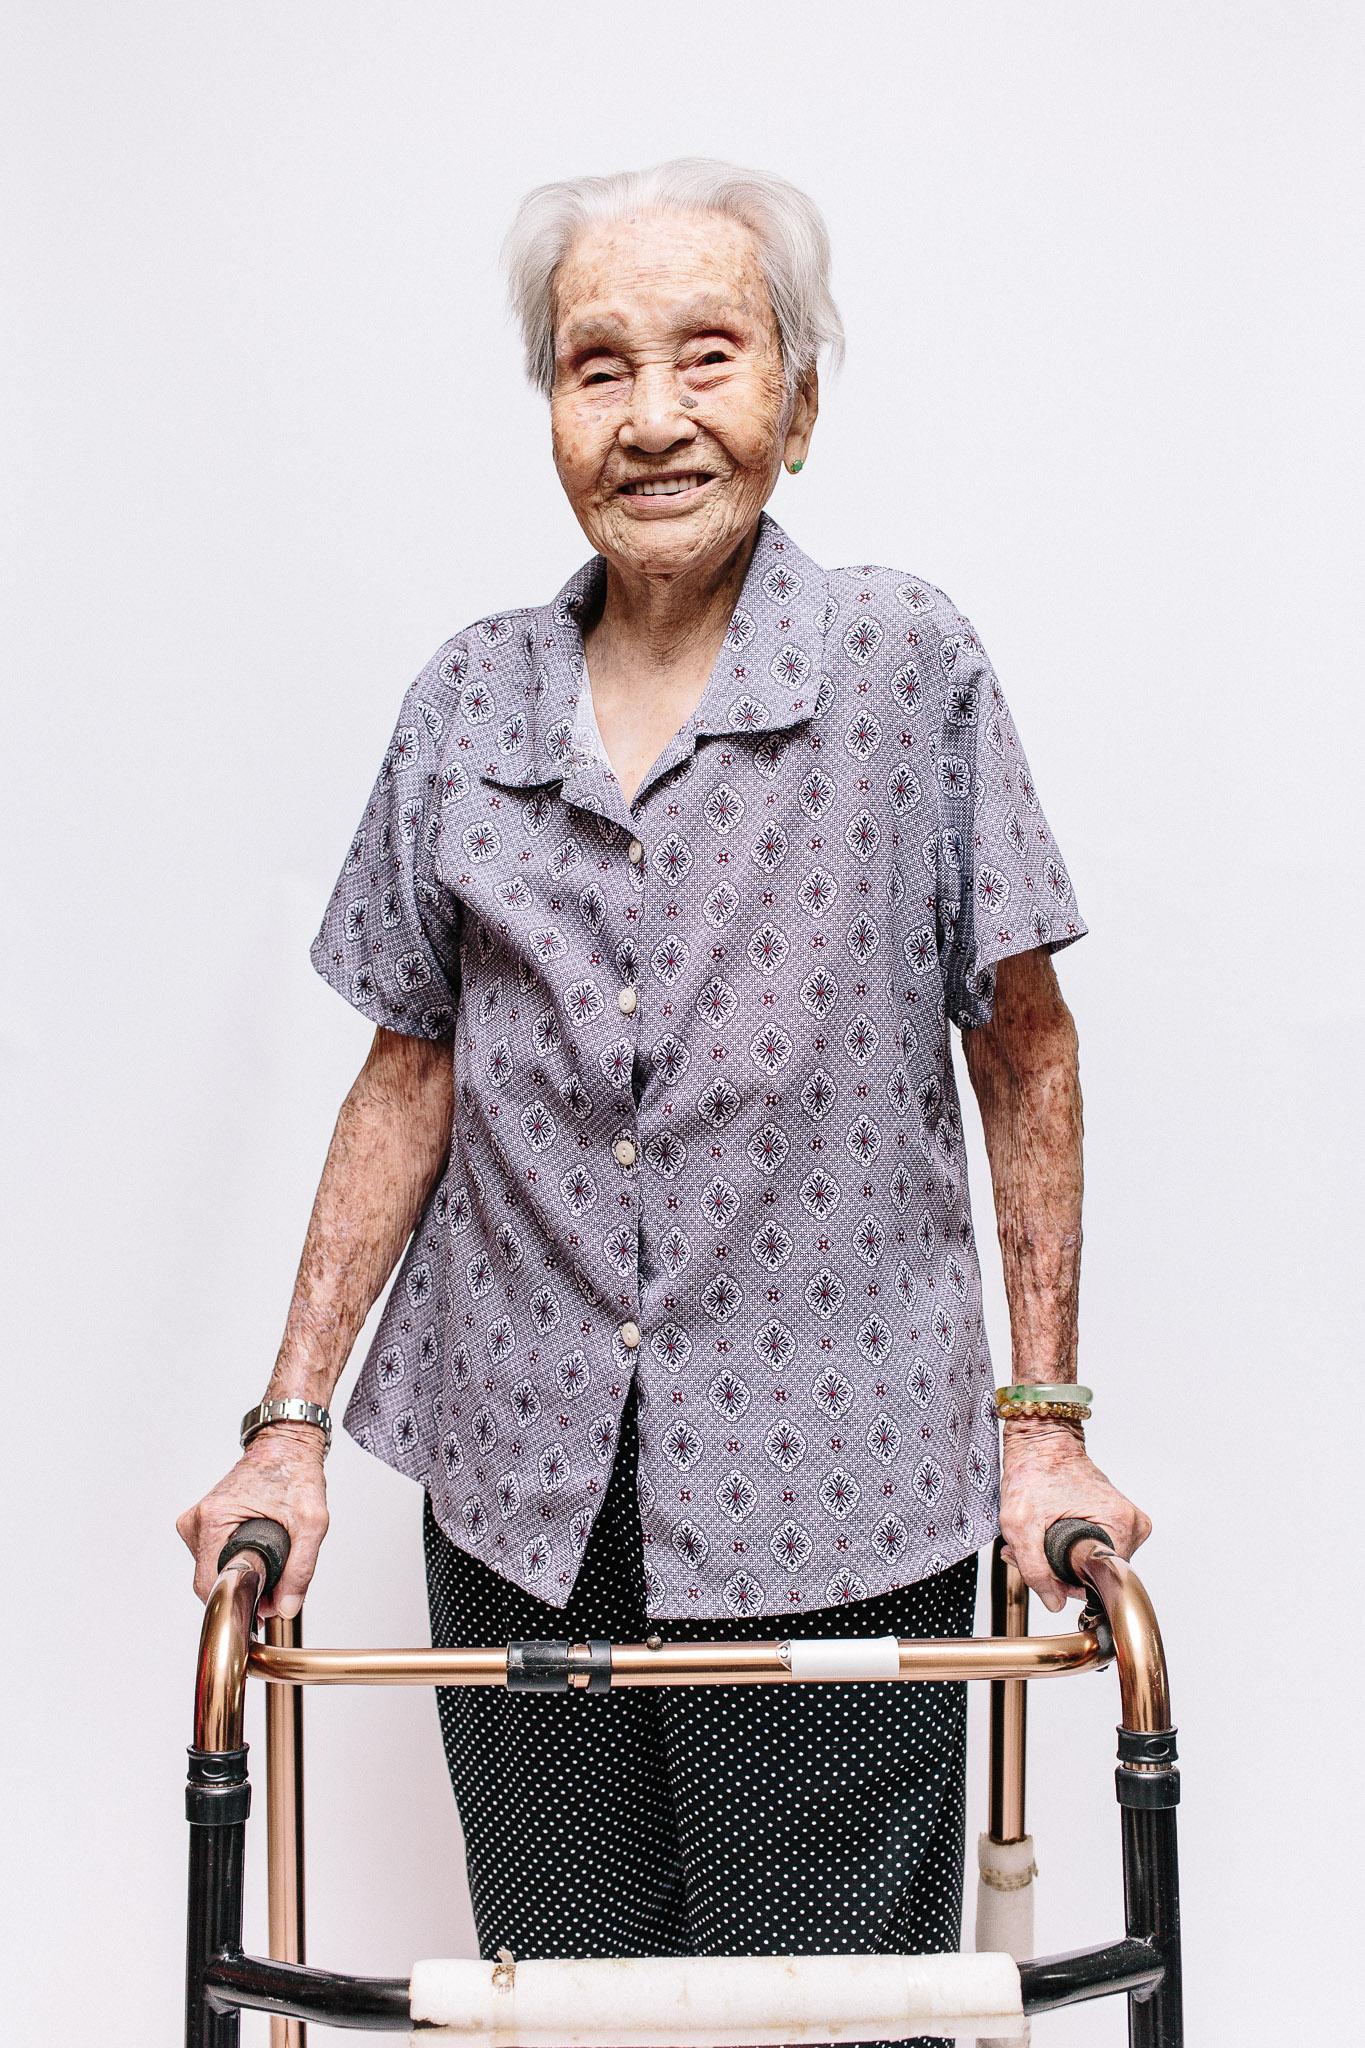 singapore-photographer-hospice-care-014.jpg